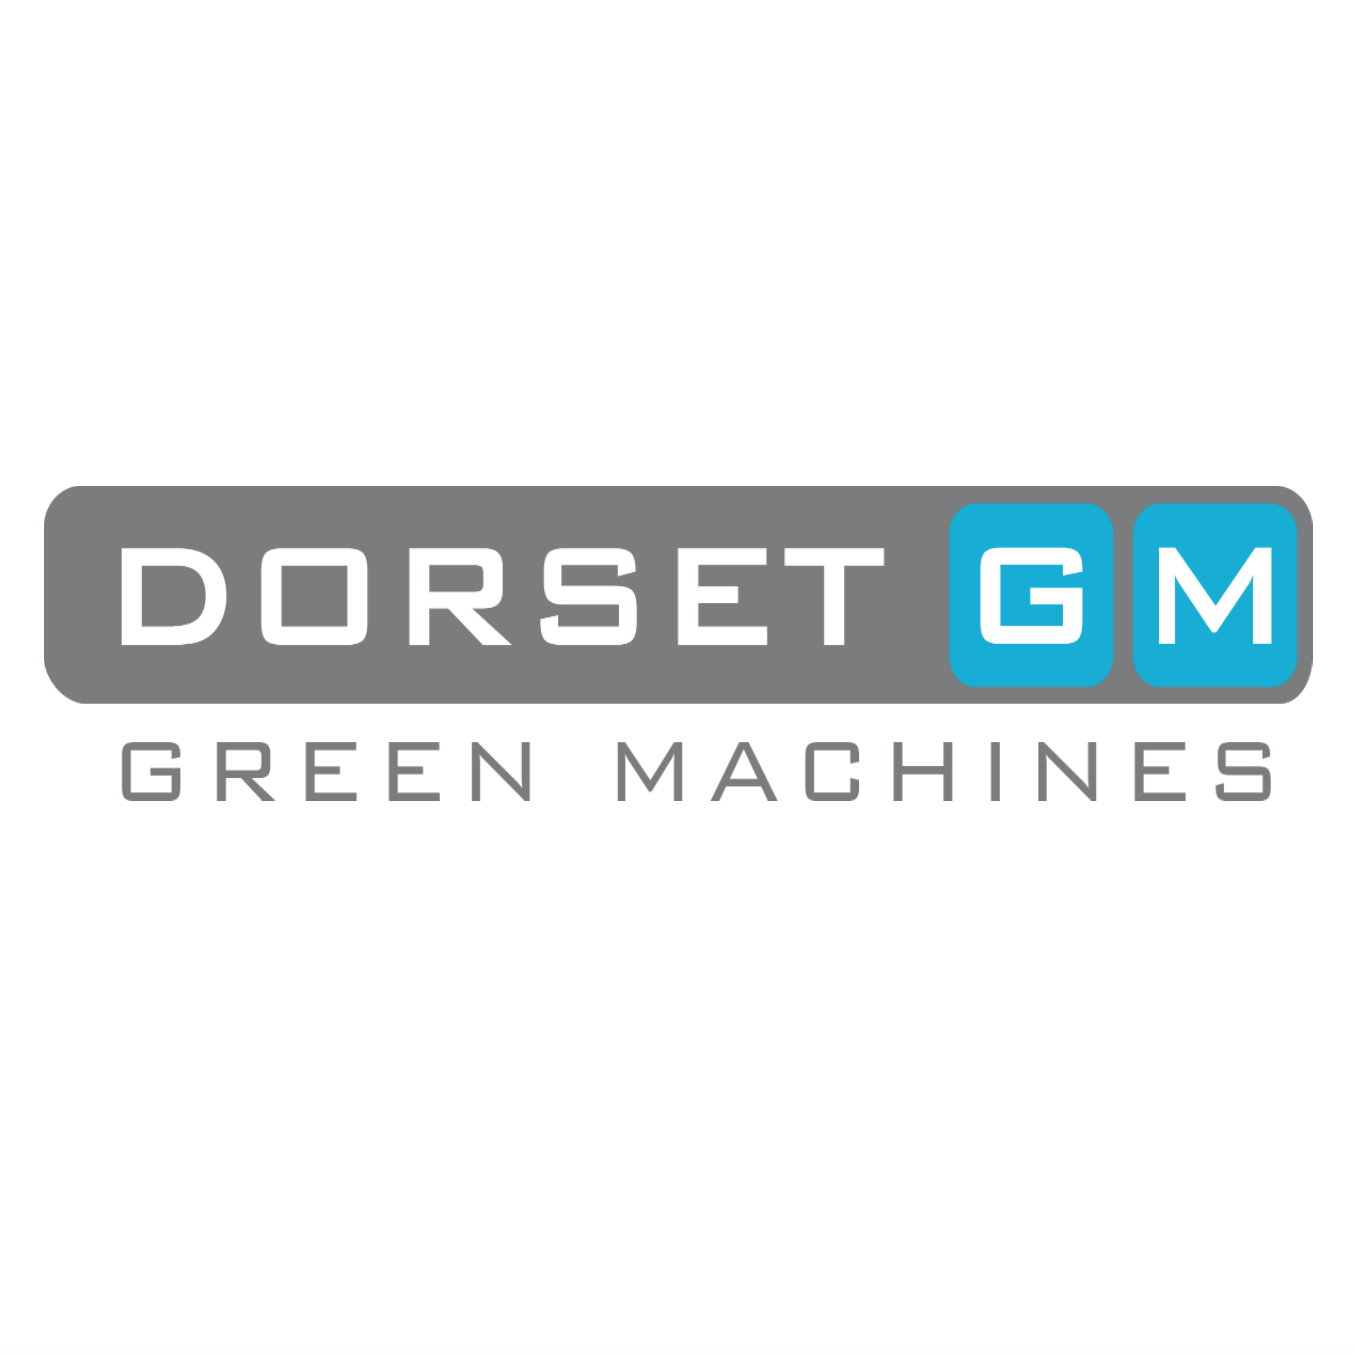 Dorset Green Machines BV